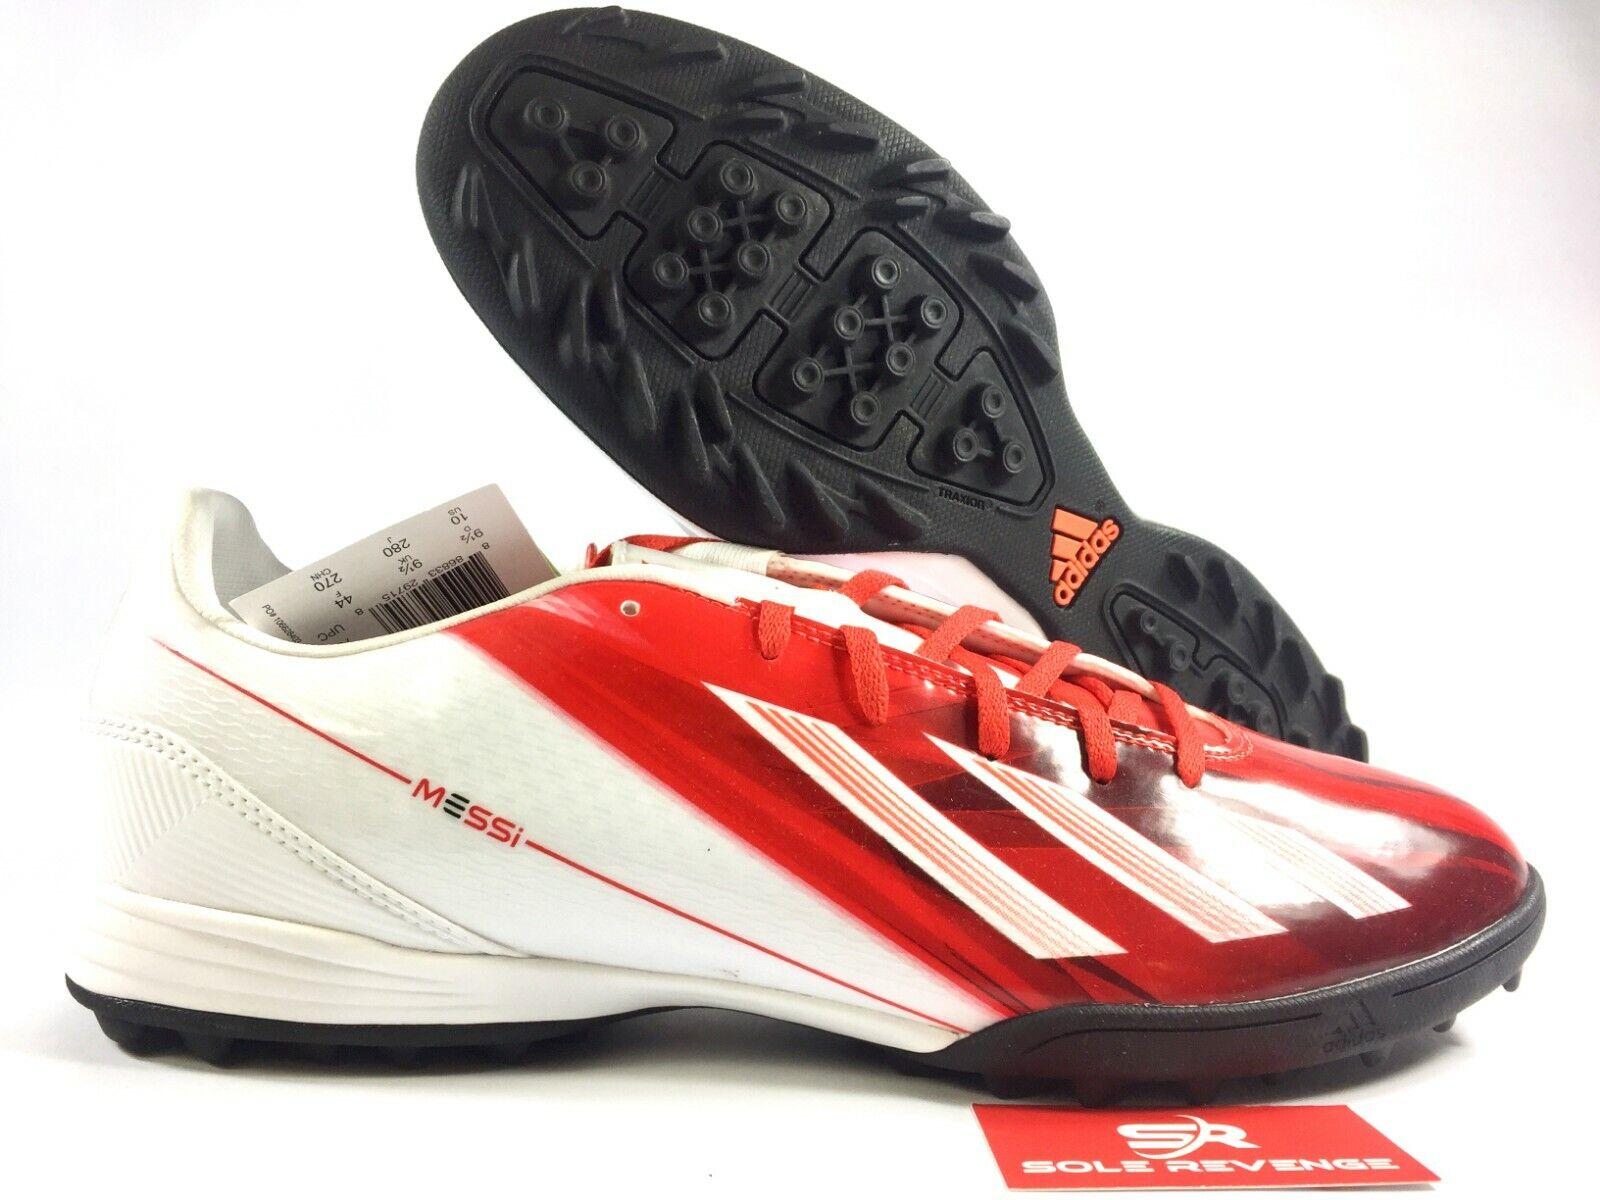 de1670d7c New adidas MESSI F10 TRX TF Turf Soccer shoes White Red Mens Q22441 x1